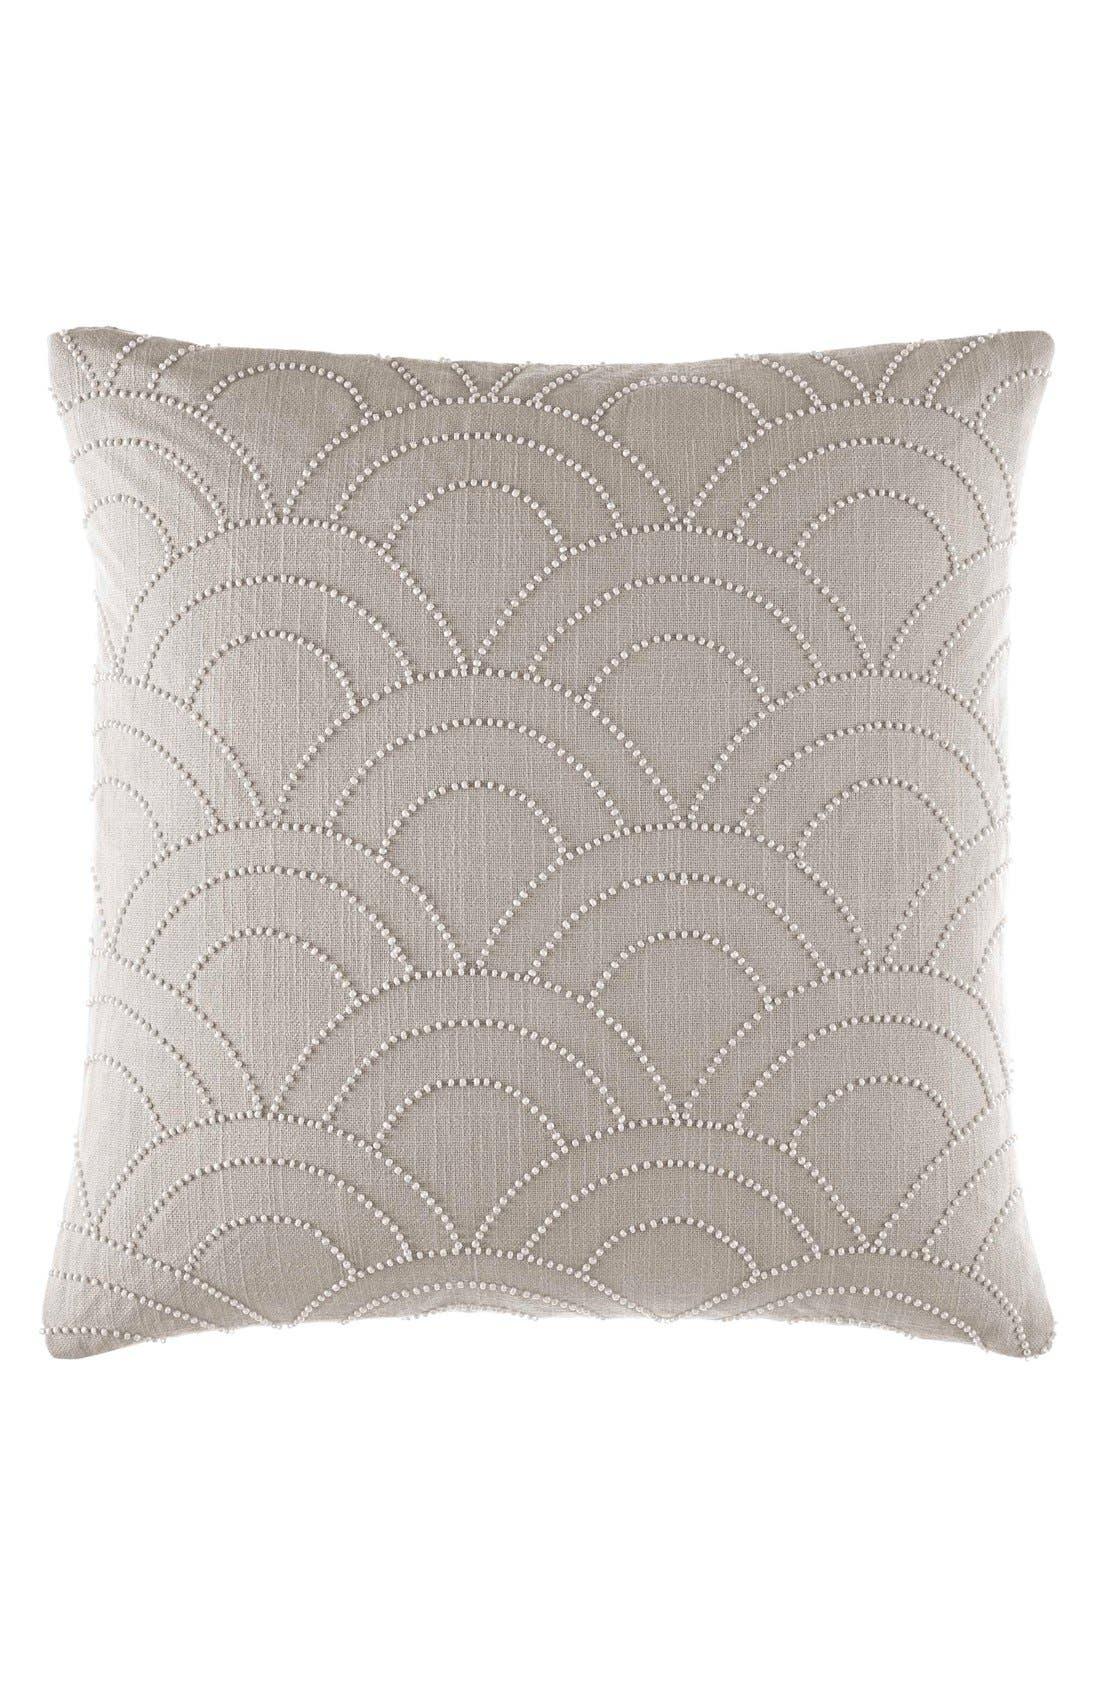 'Metro Adrian' Beaded Pillow,                         Main,                         color, 020